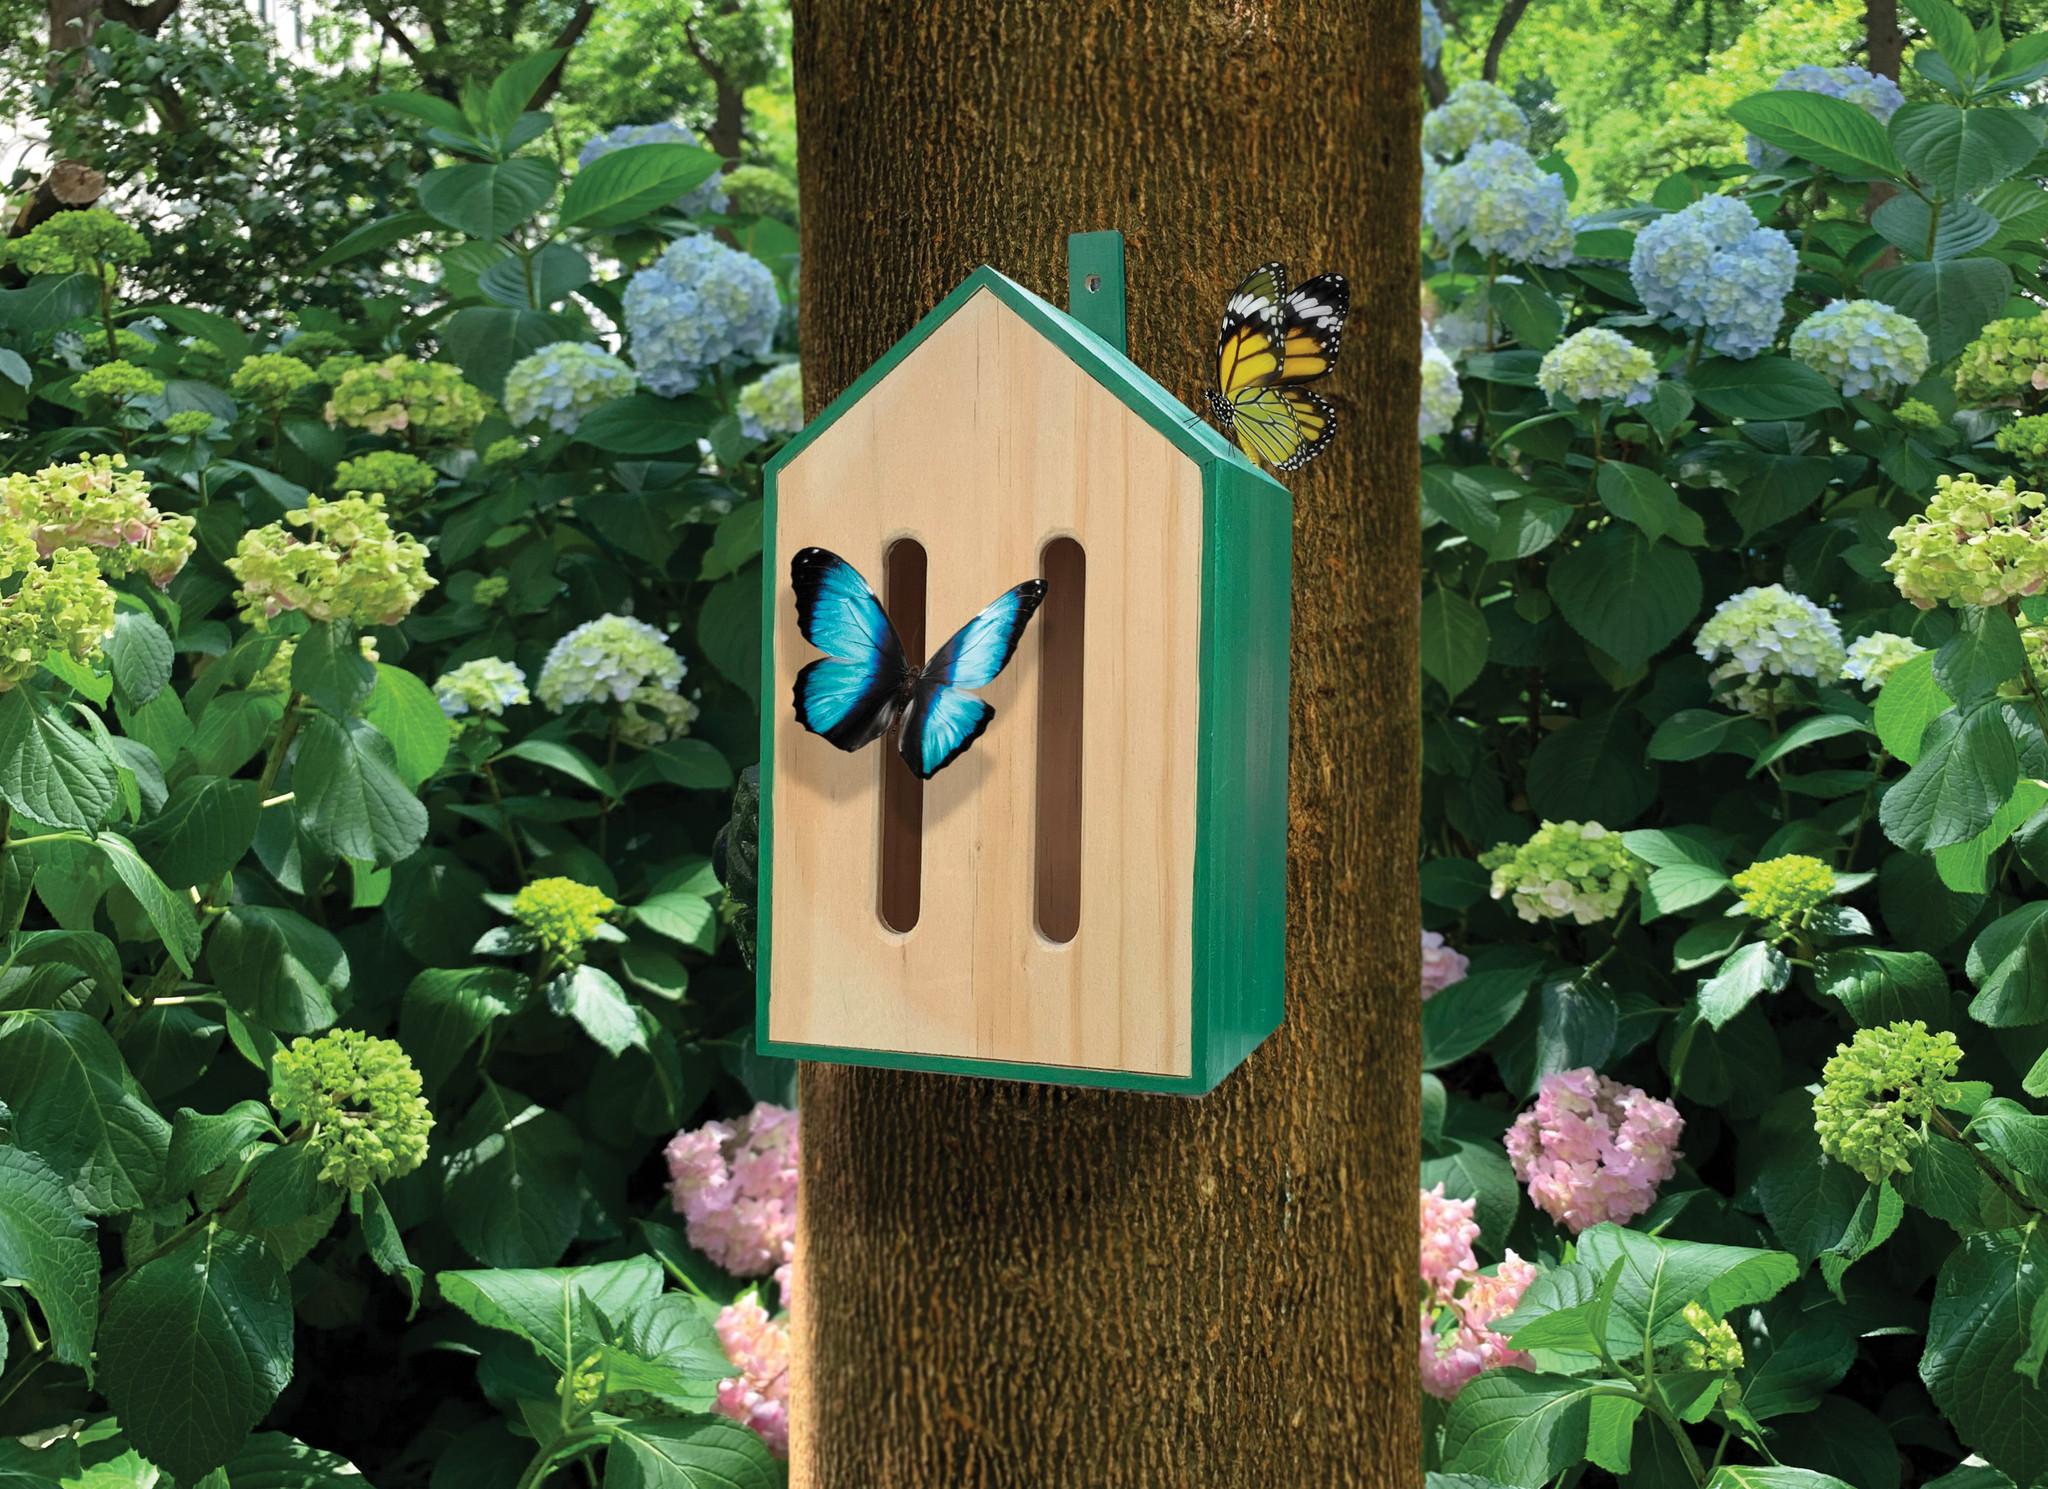 Little Butterfly House